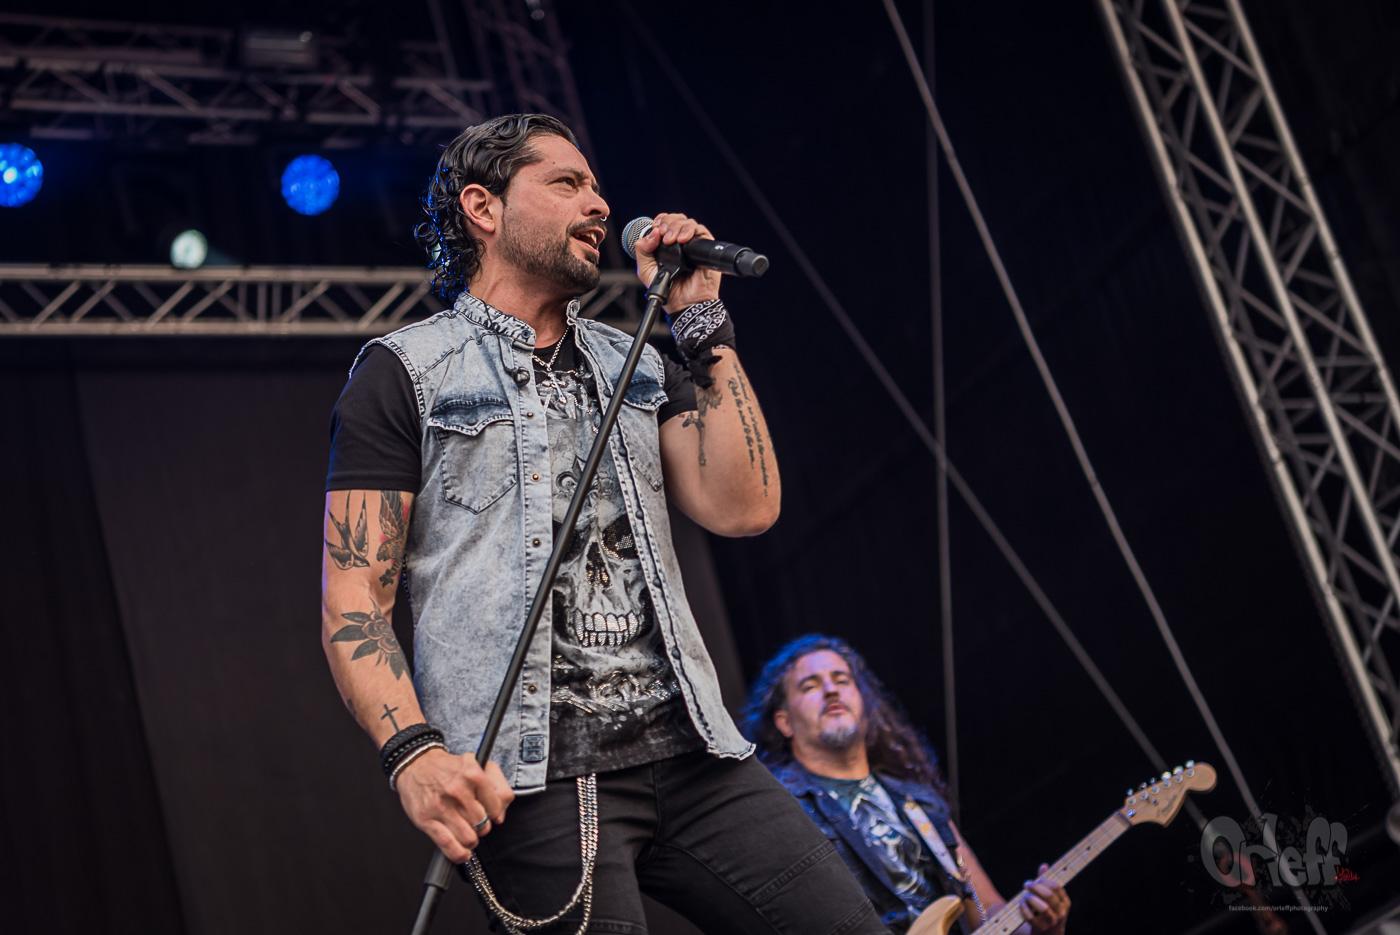 Ronnie Romero & Eridan @ Hills Of Rock, 2019